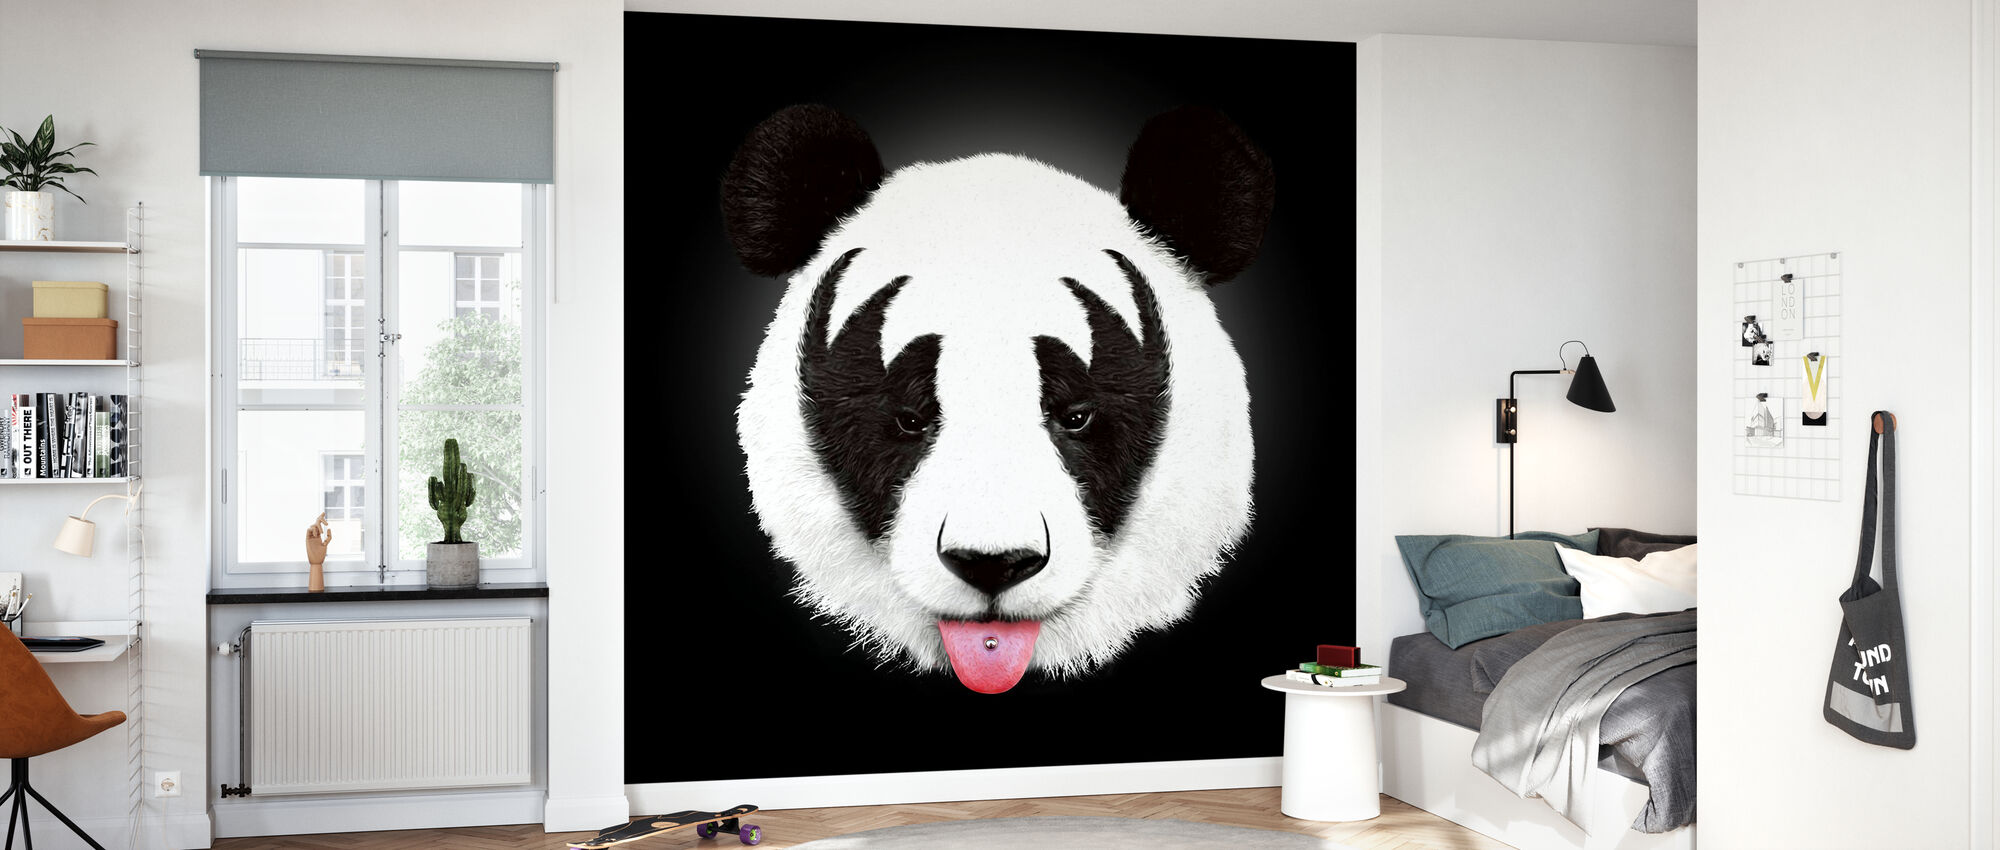 Kiss of a Panda - Wallpaper - Kids Room